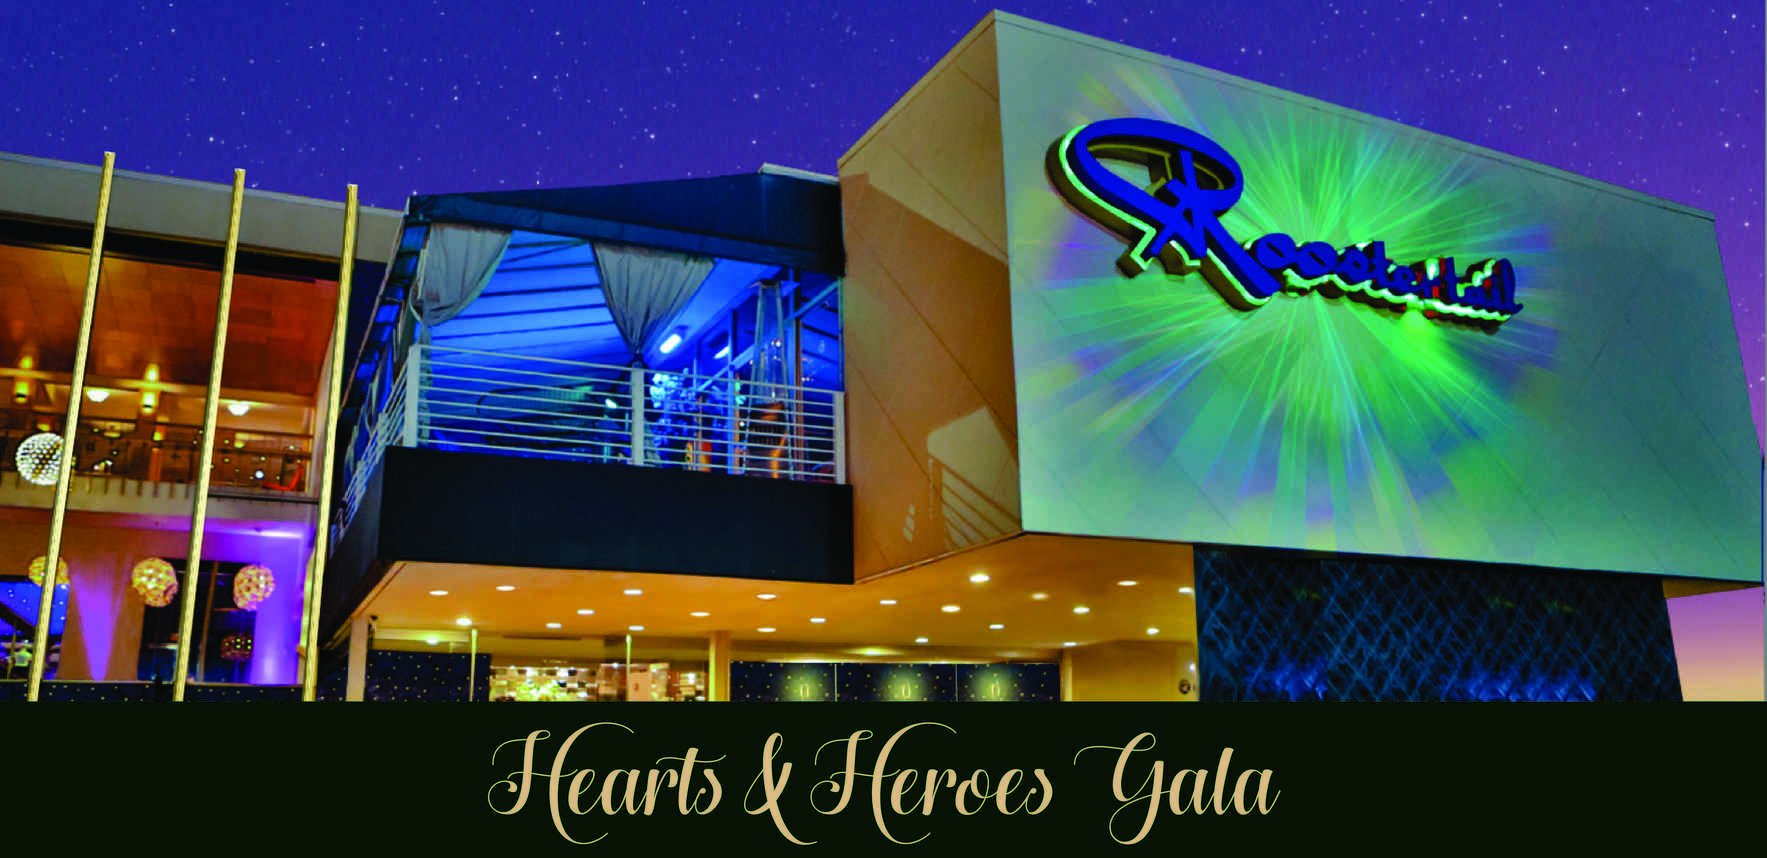 MCHS Hearts & Heroes Gala image